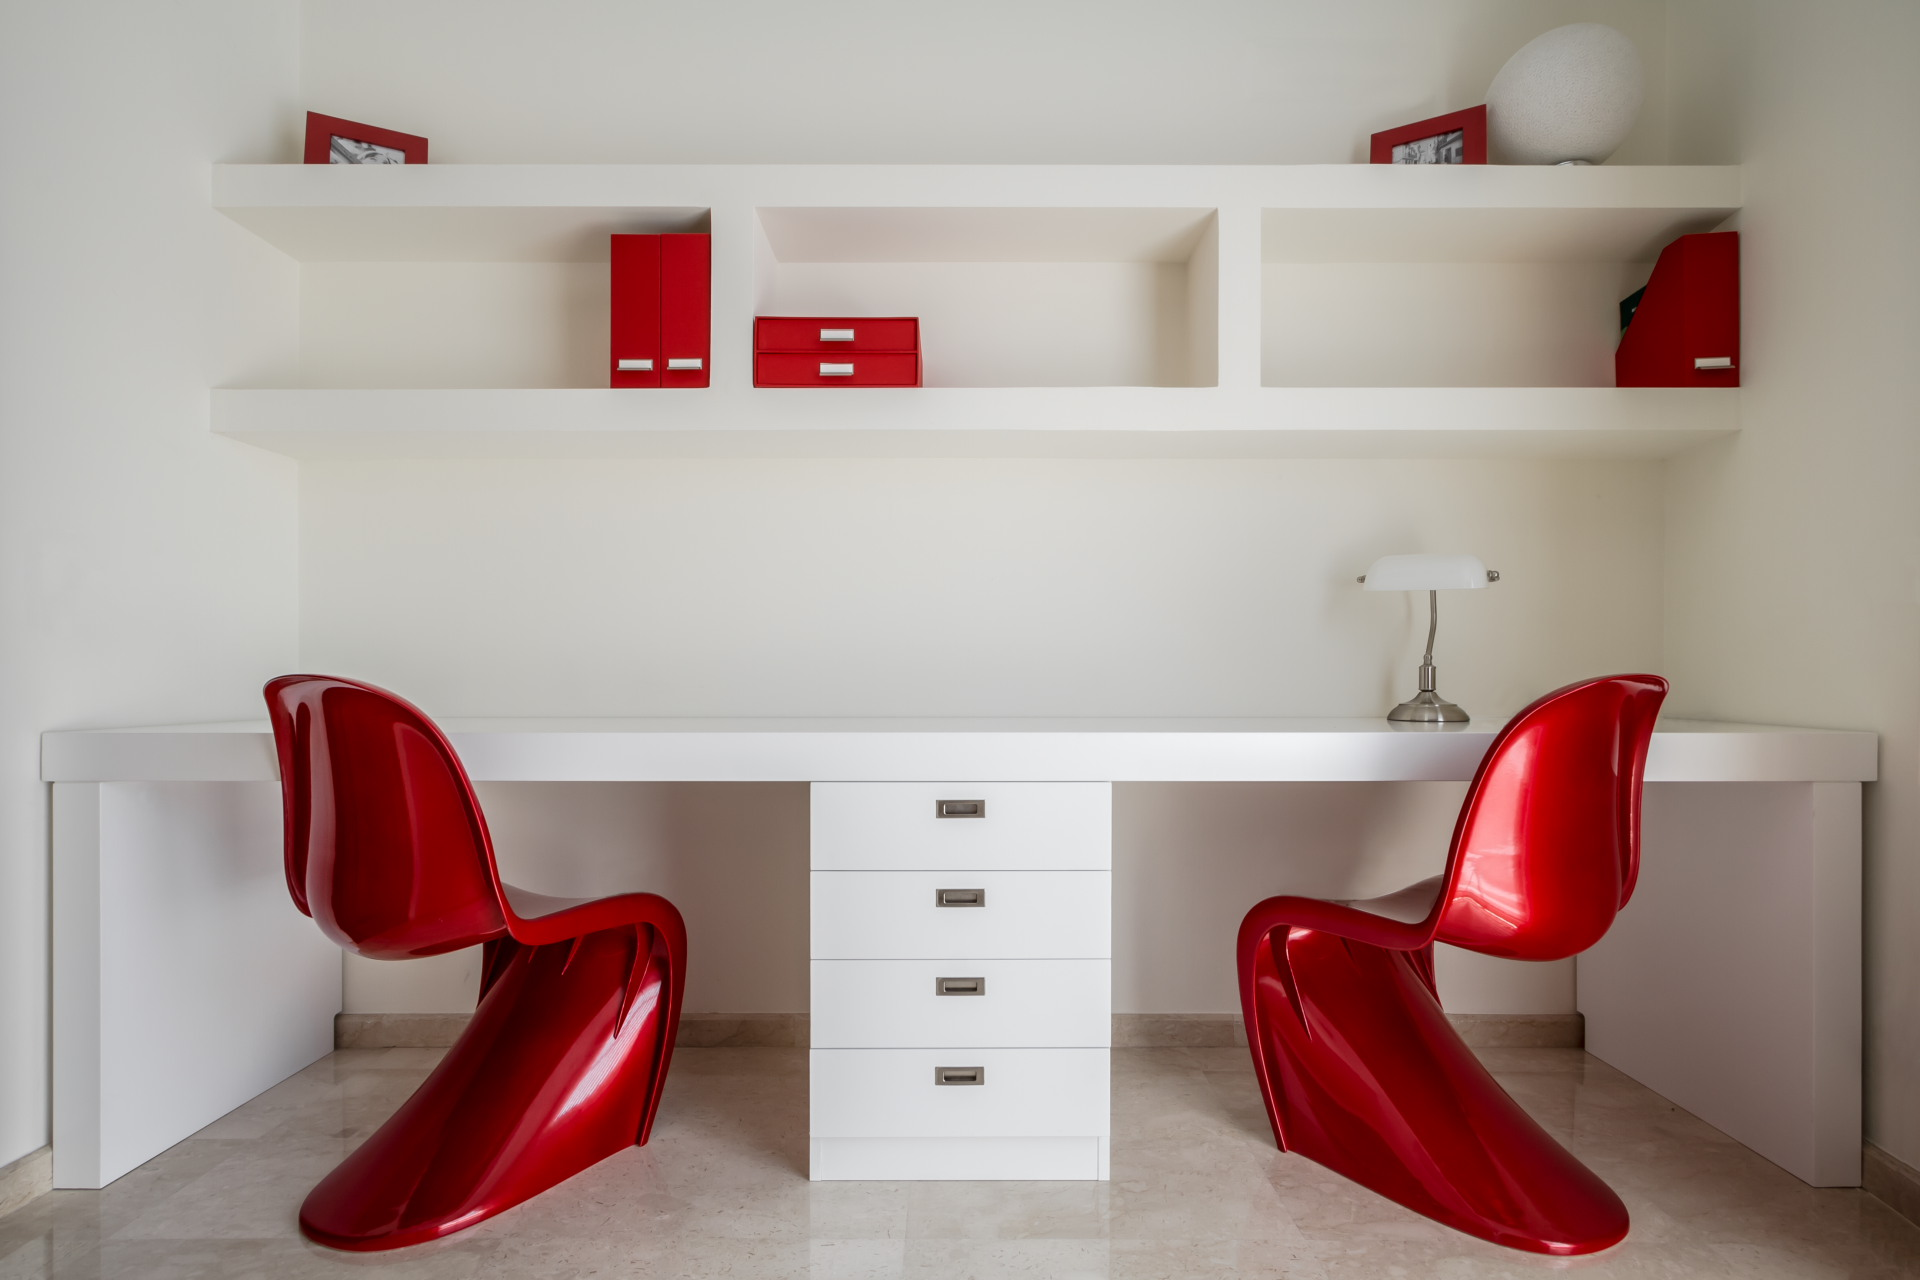 fotografia-arquitectura-interiorismo-valencia-german-cabo-daniela-beaini-alcacer (14)